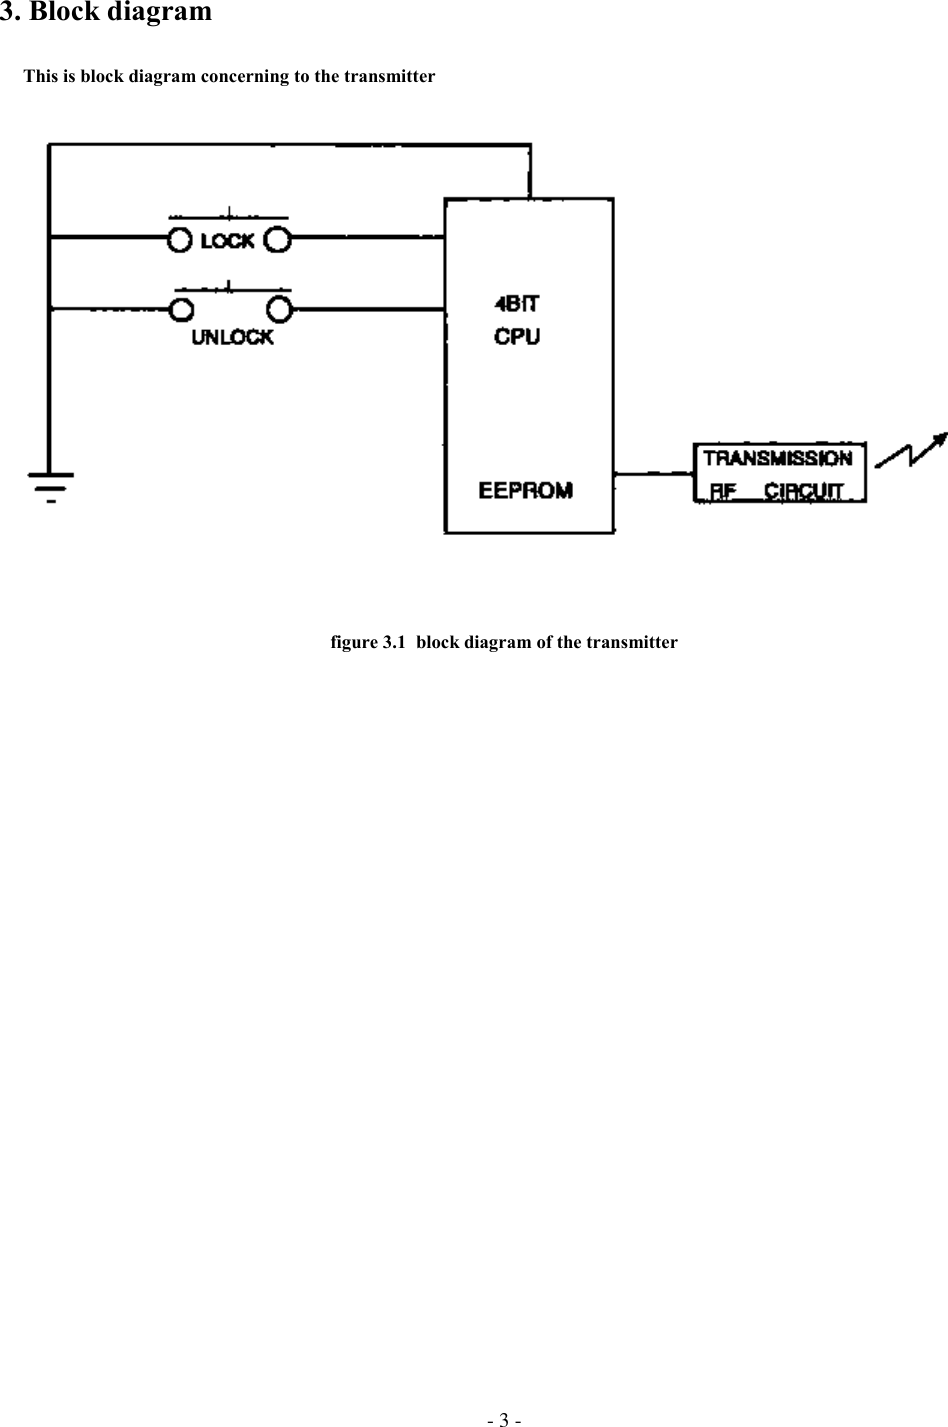 Omron Automotive Electronics Korea Oka 510t Rf Keyless Entry System Block Diagram Of Radio Transmitter This Is Concerning To The Transmitterfigure 31